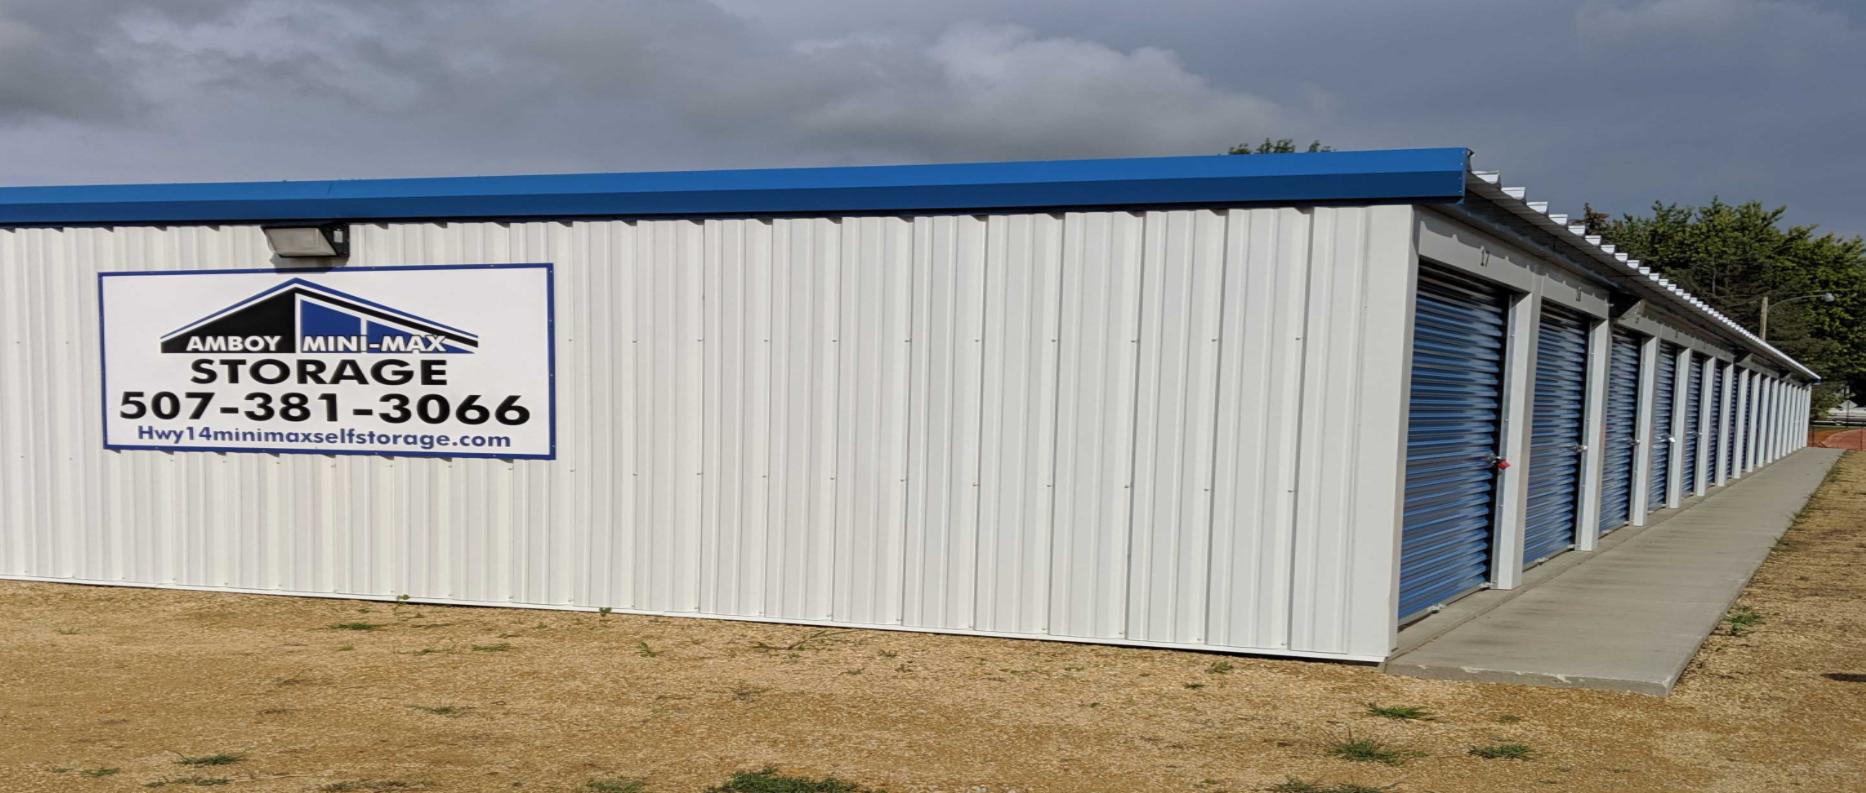 Drive up storage units in Amboy, MN